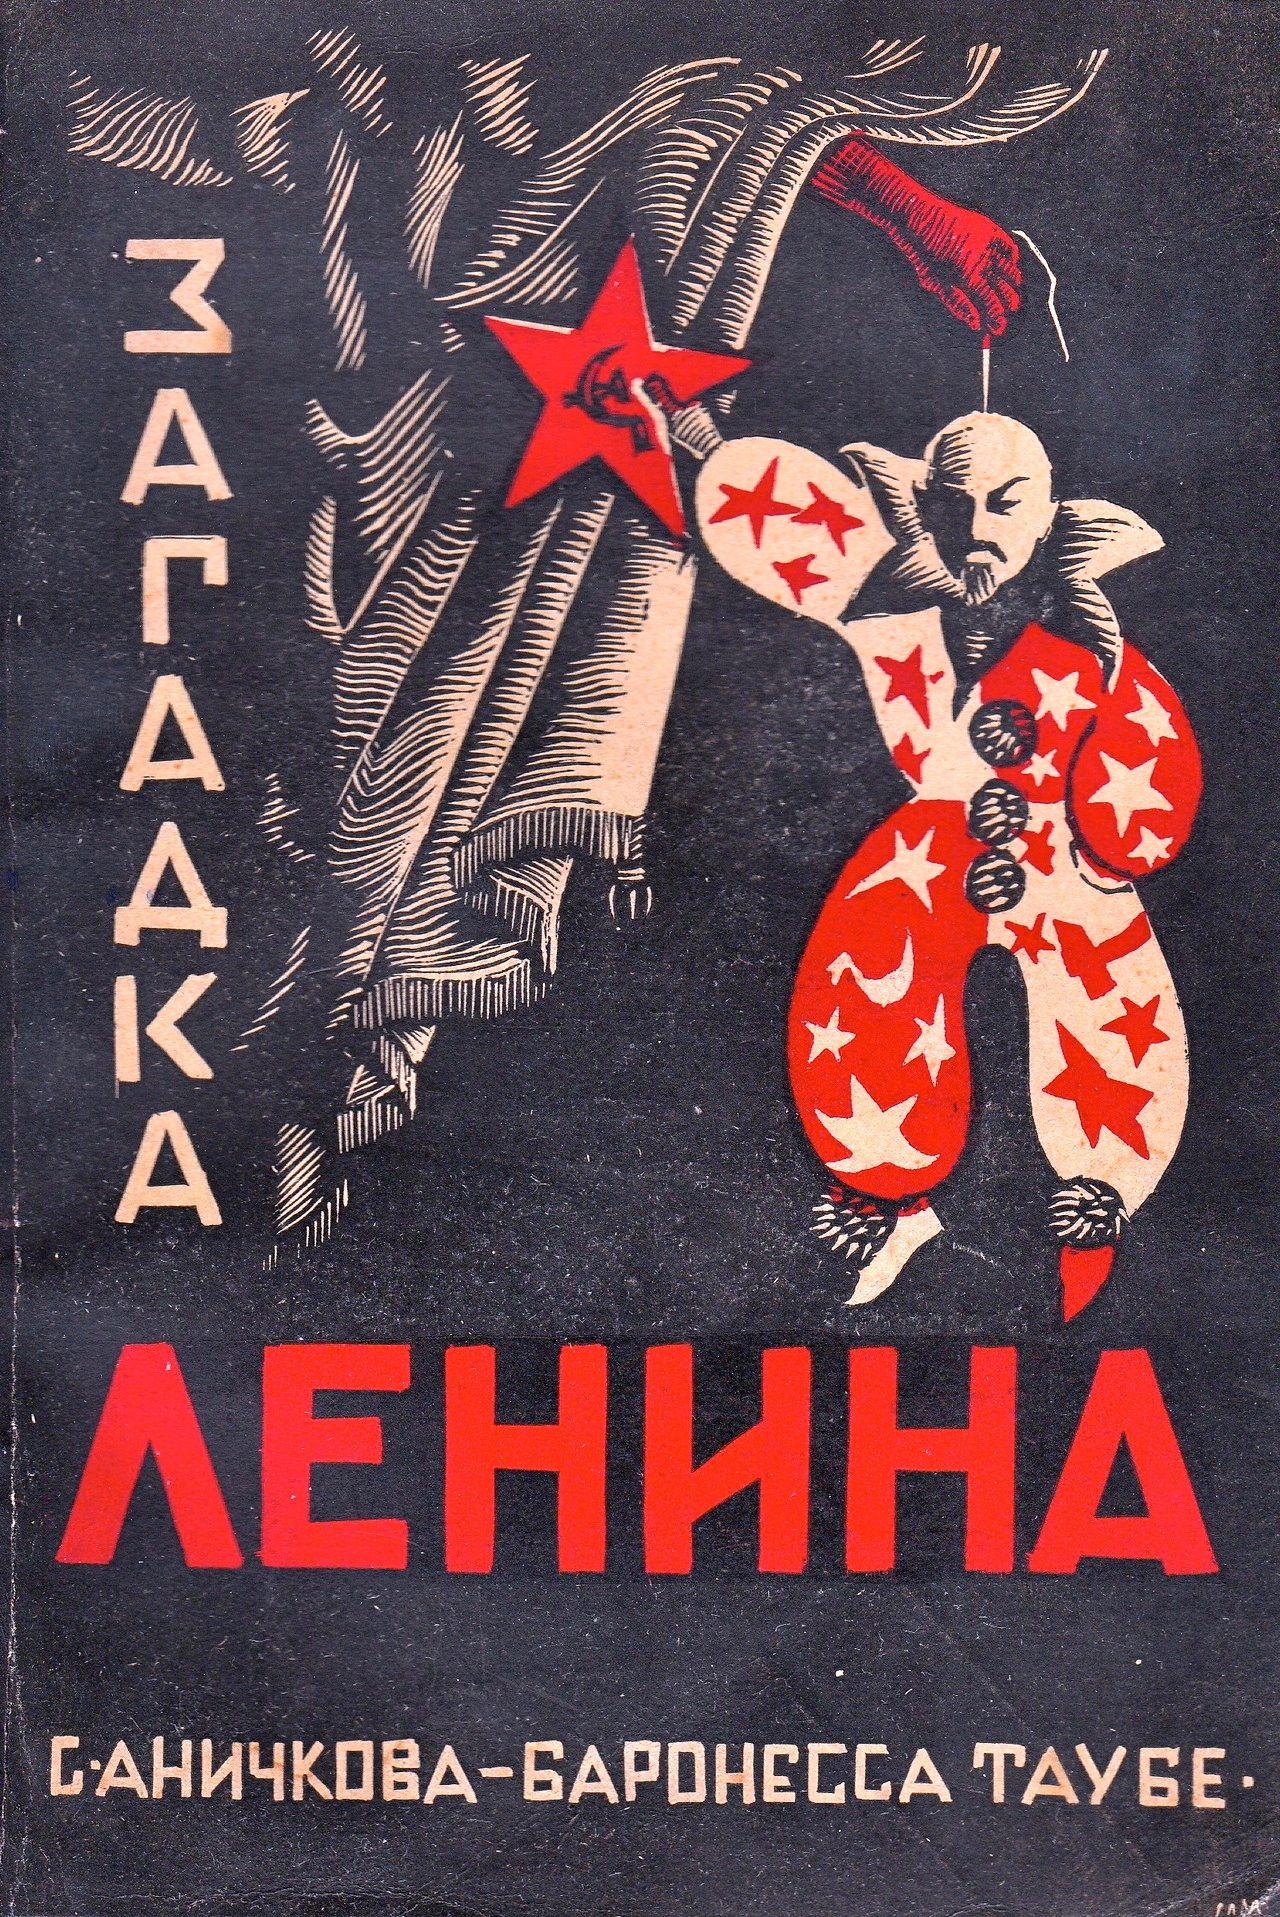 A Russian book jacket